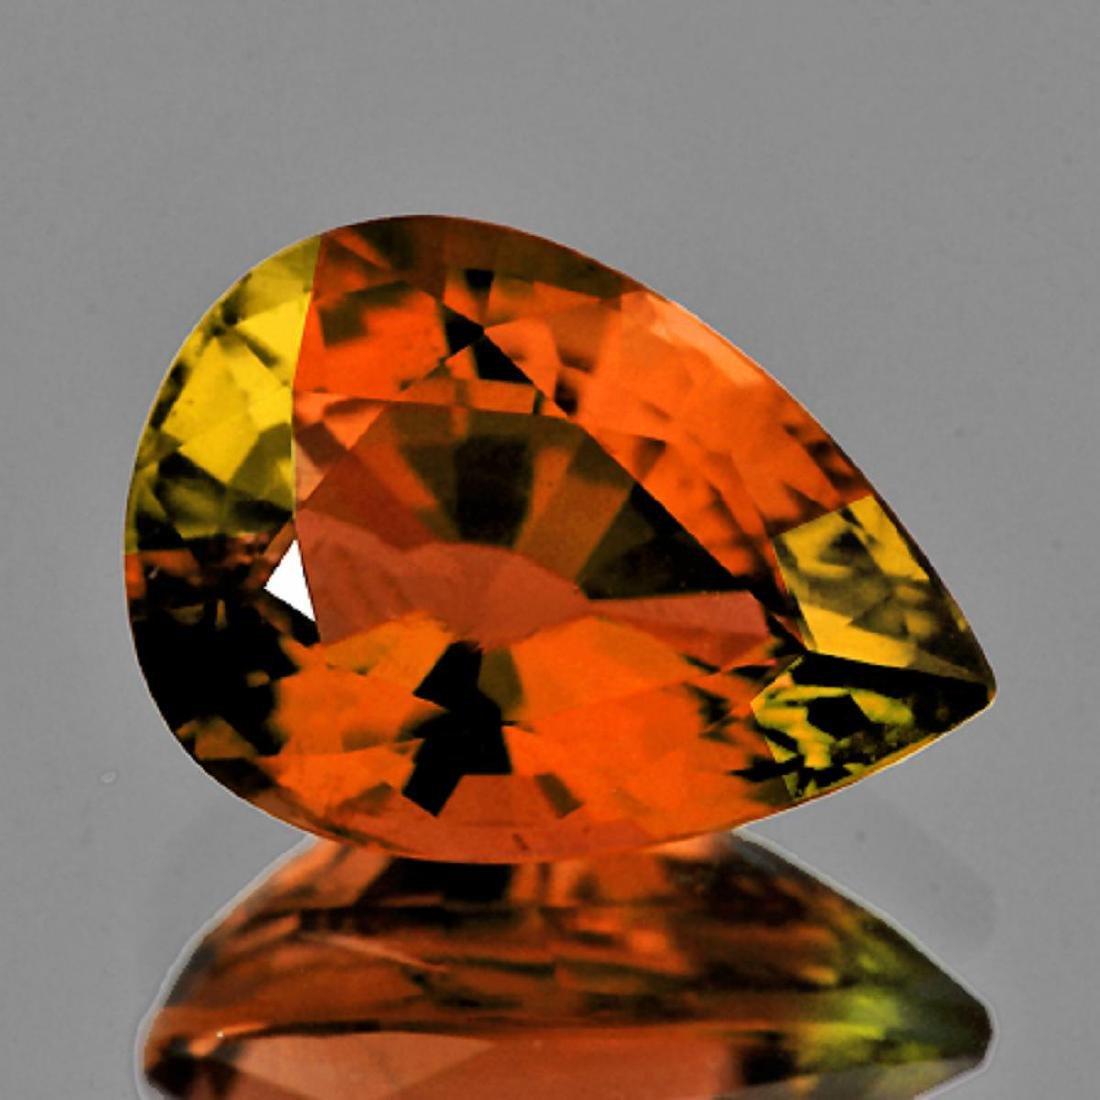 Natural AAA Vivid Orange Tourmaline 1.15 Ct - Flawless